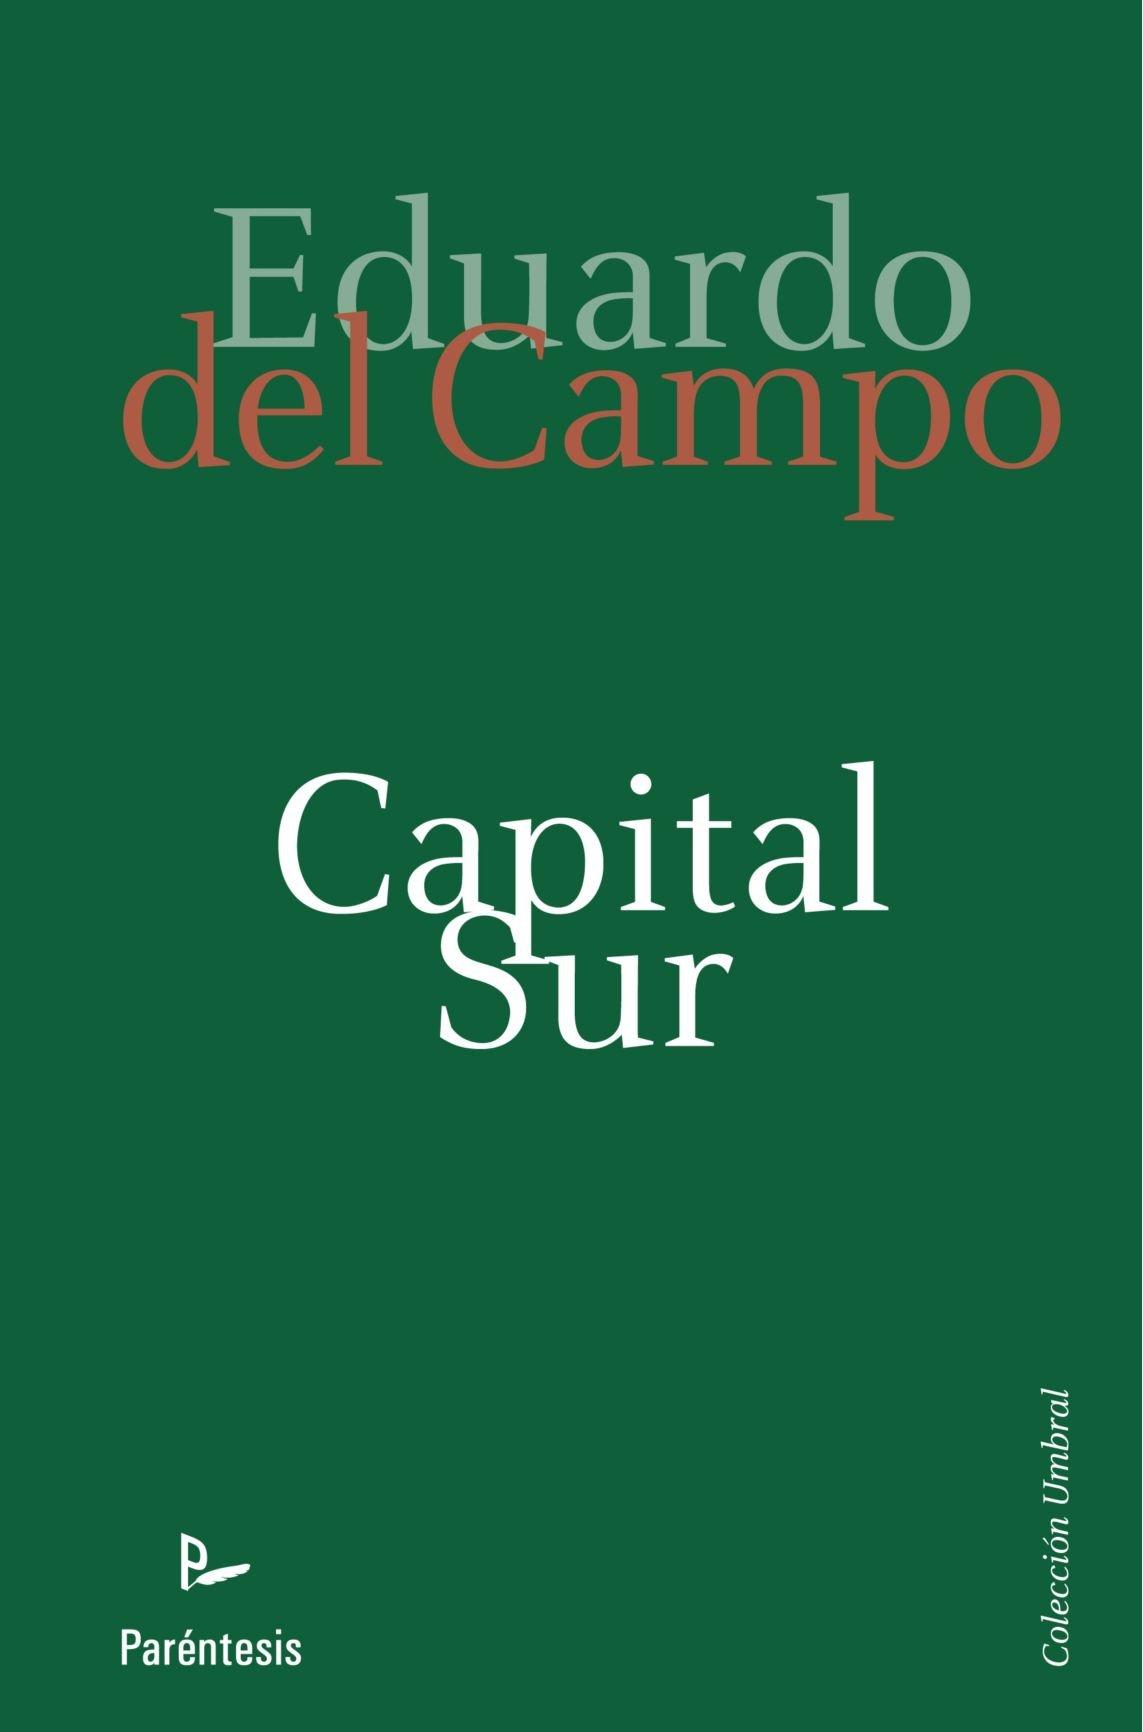 Capital Sur (Spanish Edition): Eduardo del Campo: 9788499191997: Amazon.com: Books